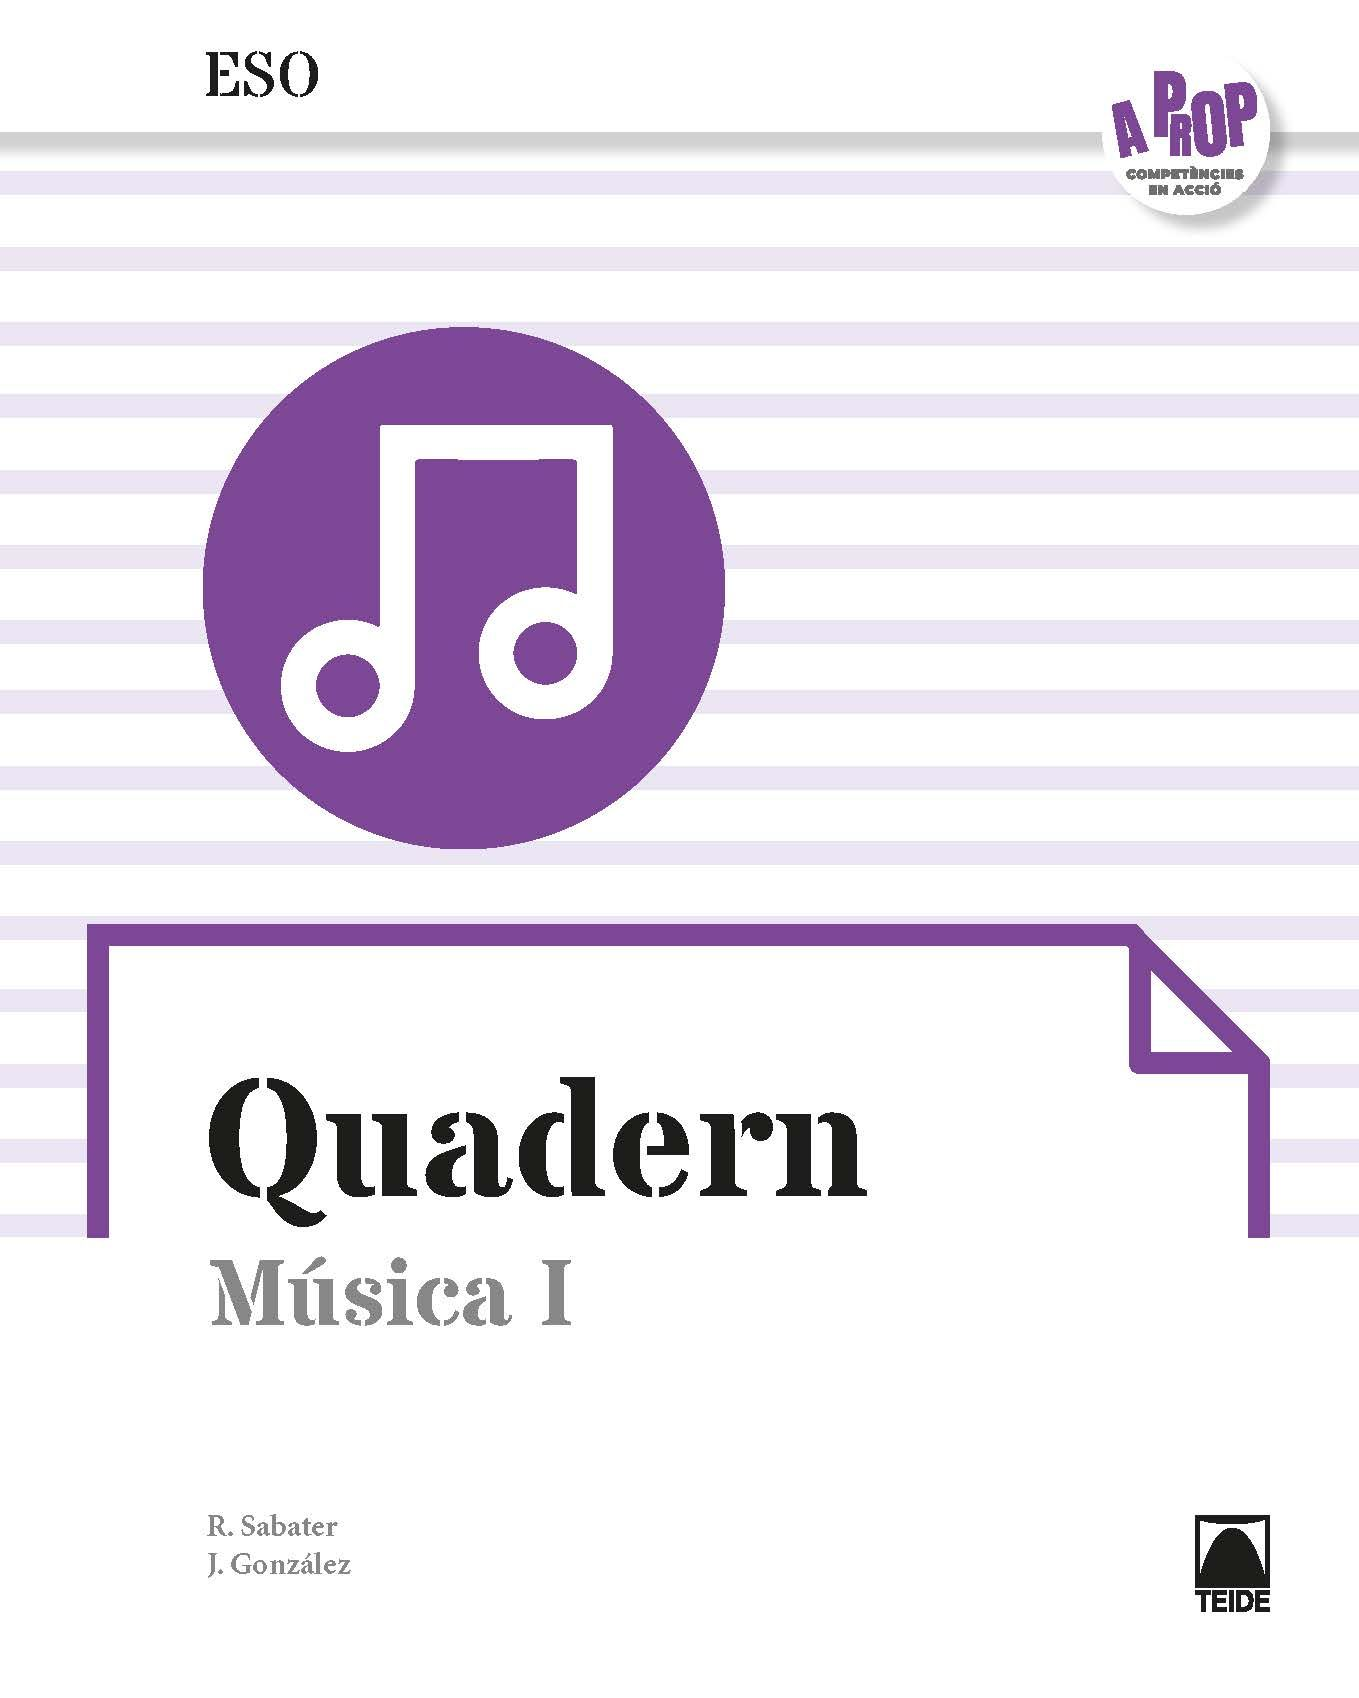 QUADERN MUSICA I ESO A PROP ED 2019